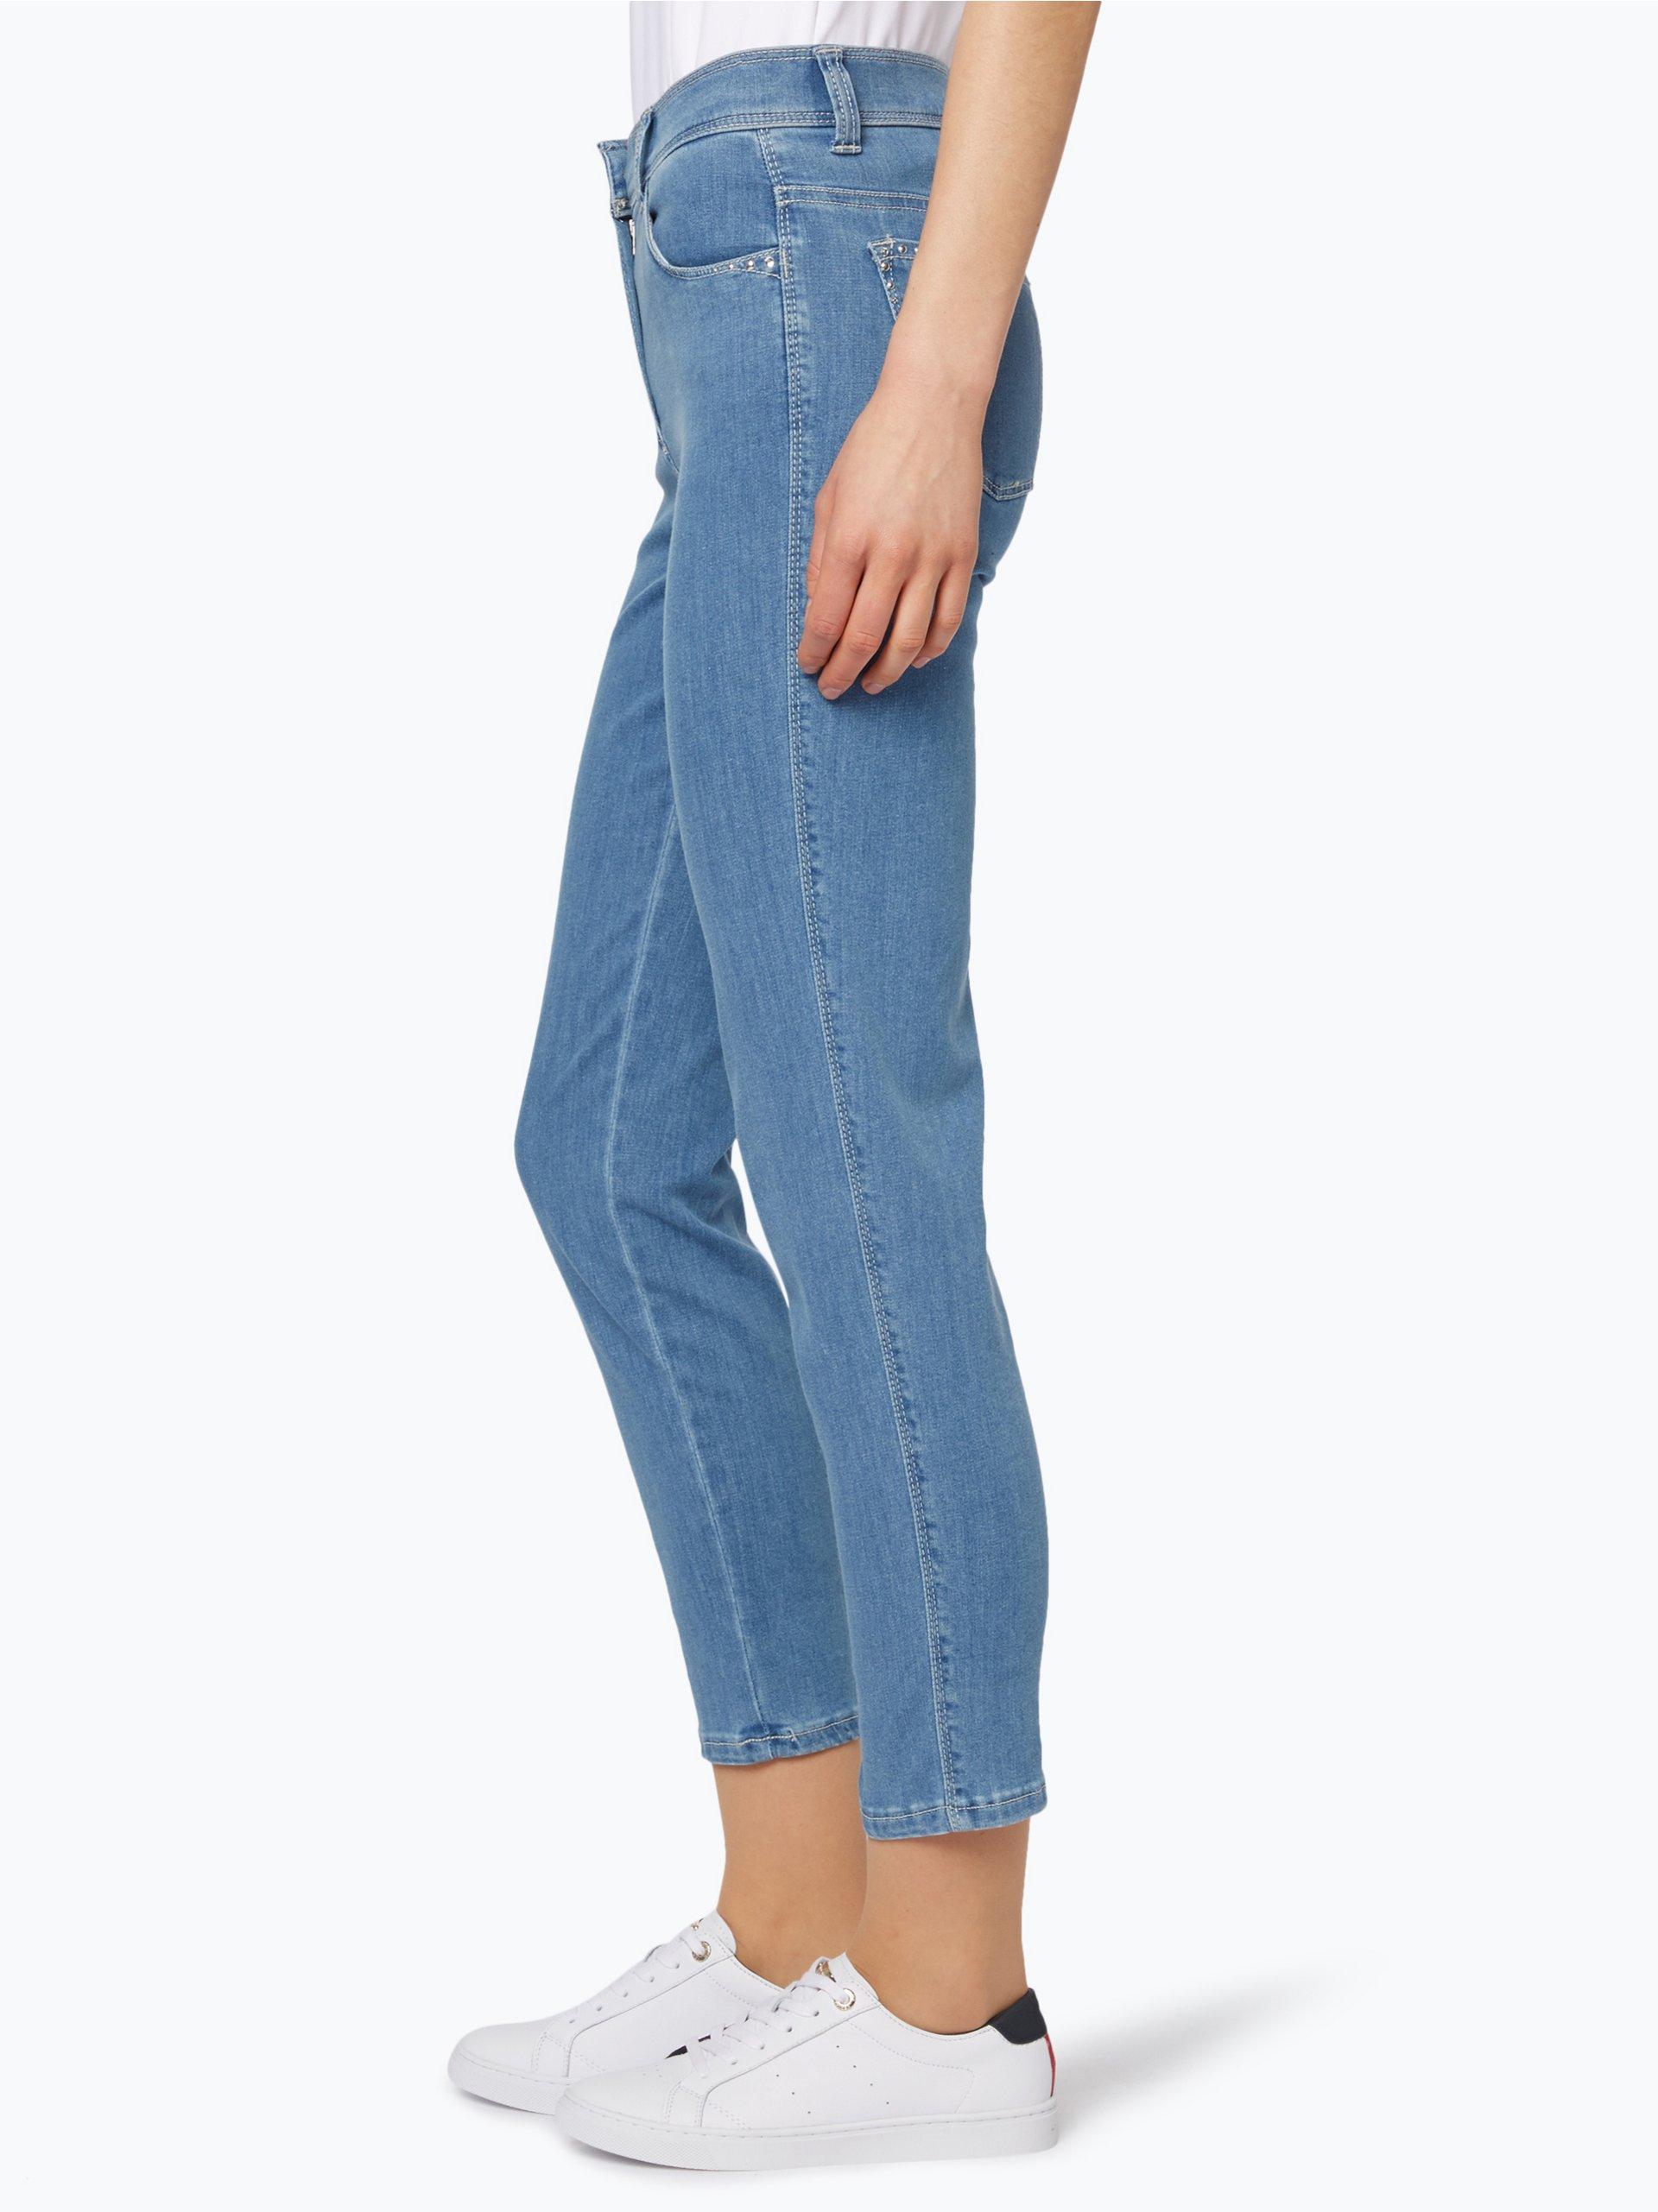 Anna Montana Damen Jeans - Angelika